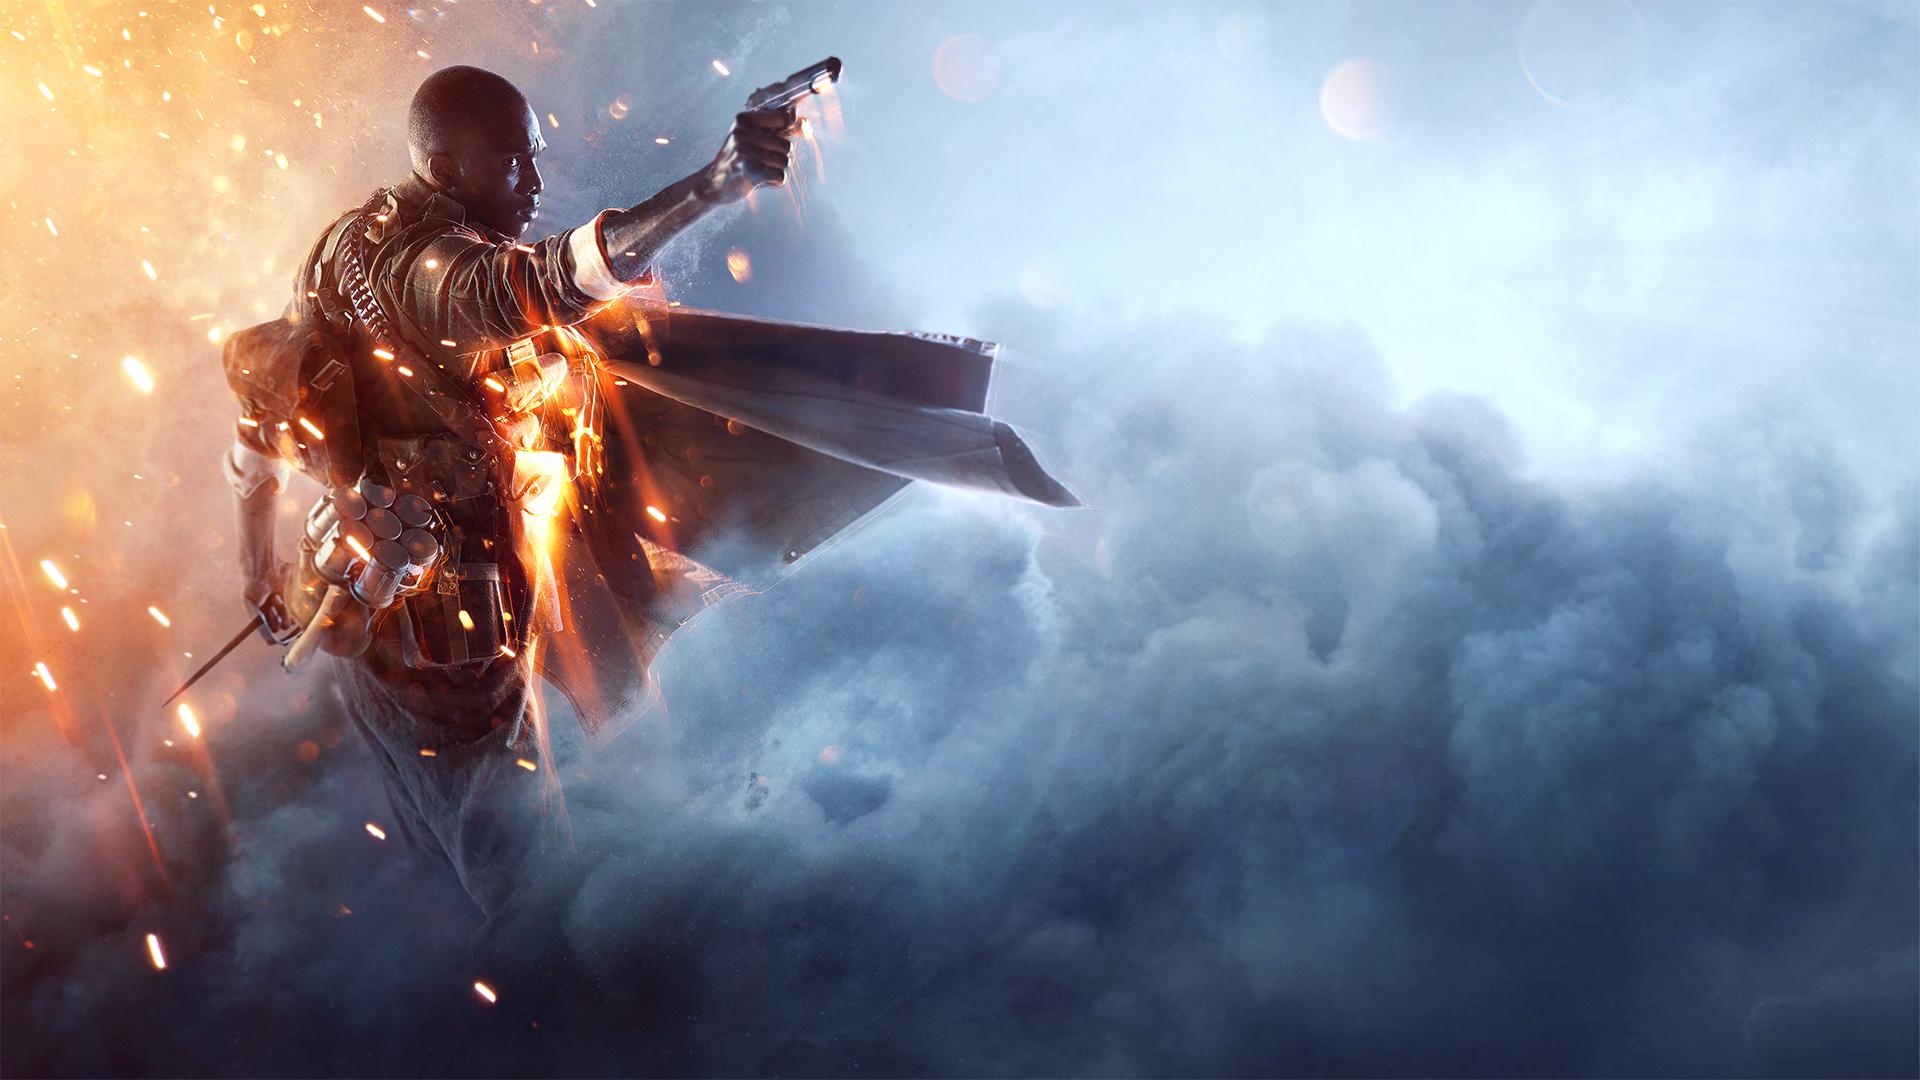 Battlefield 5: разгадана новая пасхалка от DICE, зашифрованная с помощью азбуки Морзе